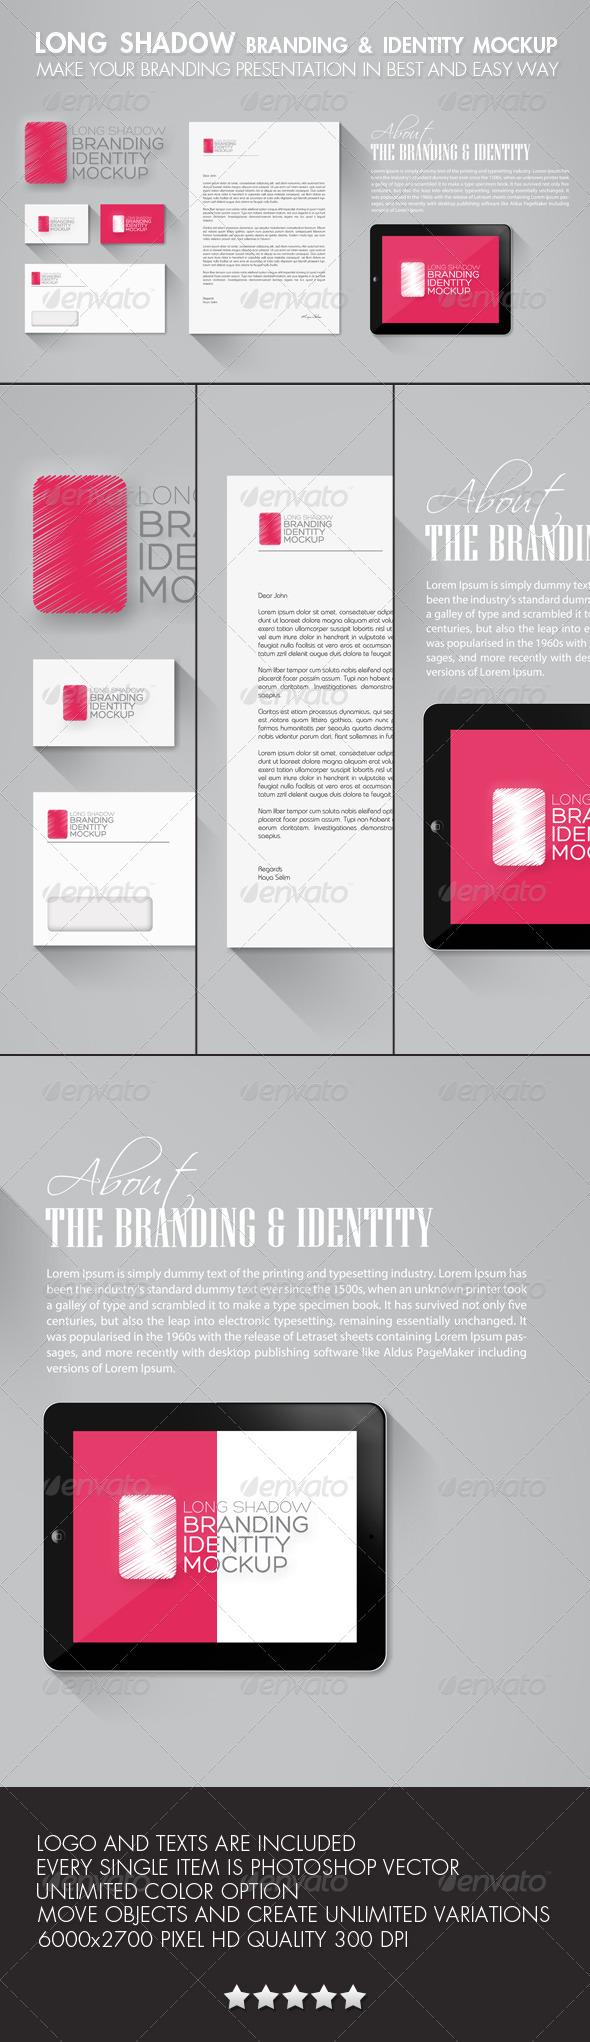 GraphicRiver Long Shadow Branding & Identity Mockup 6133841